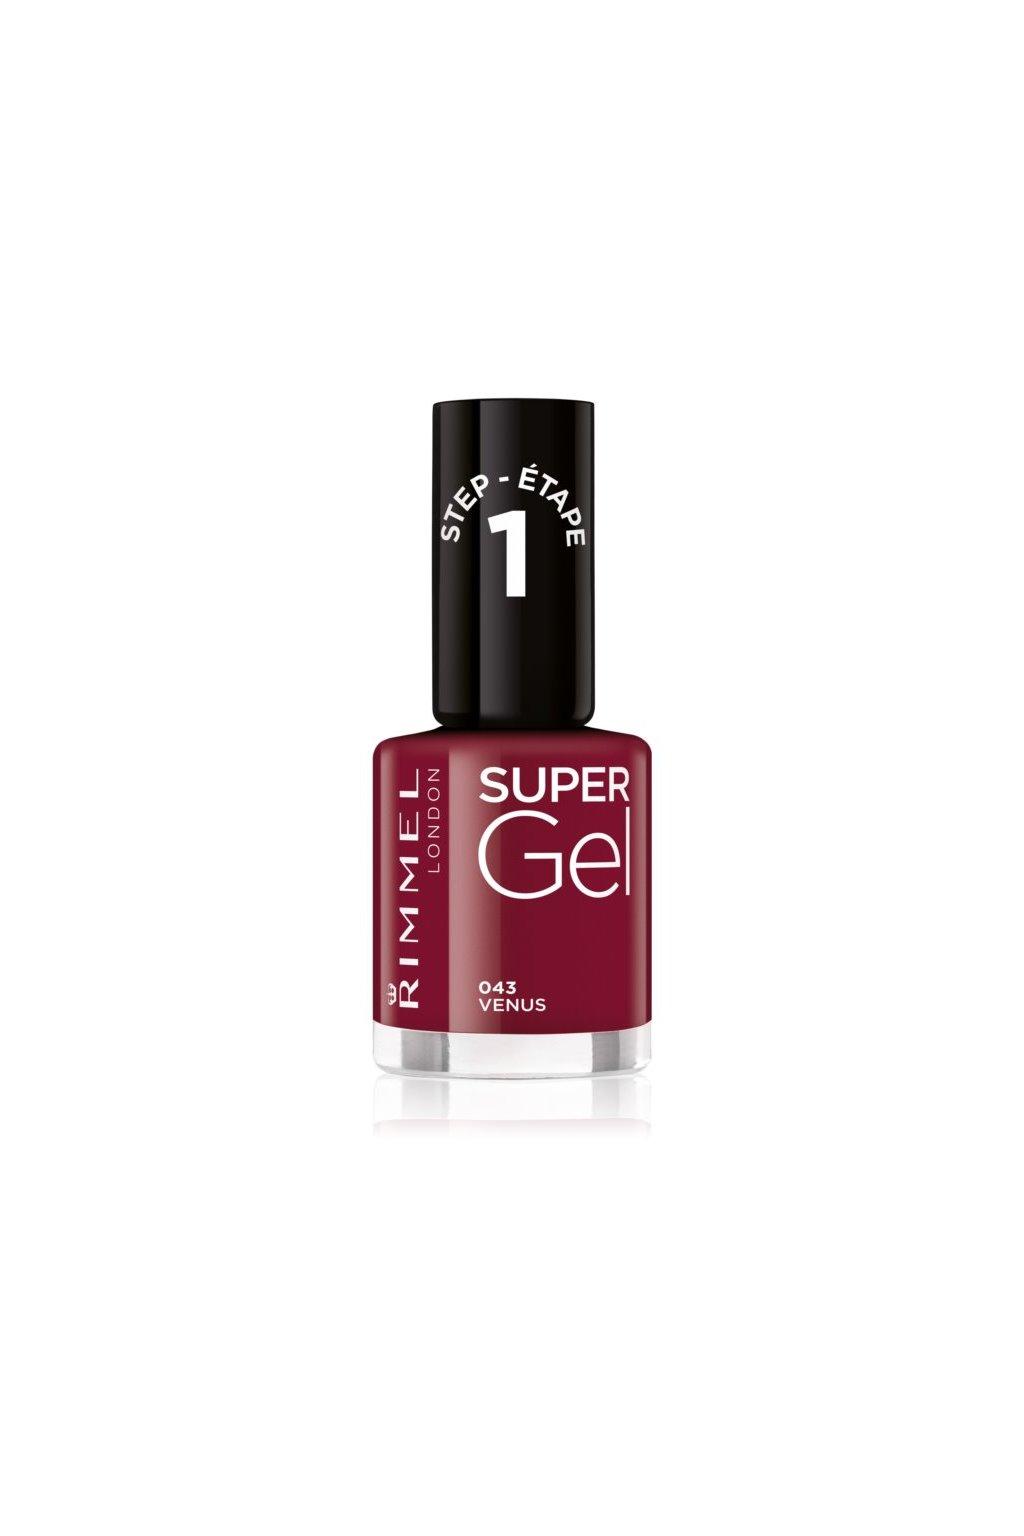 Rimmel Super Gel By Kate Lilite